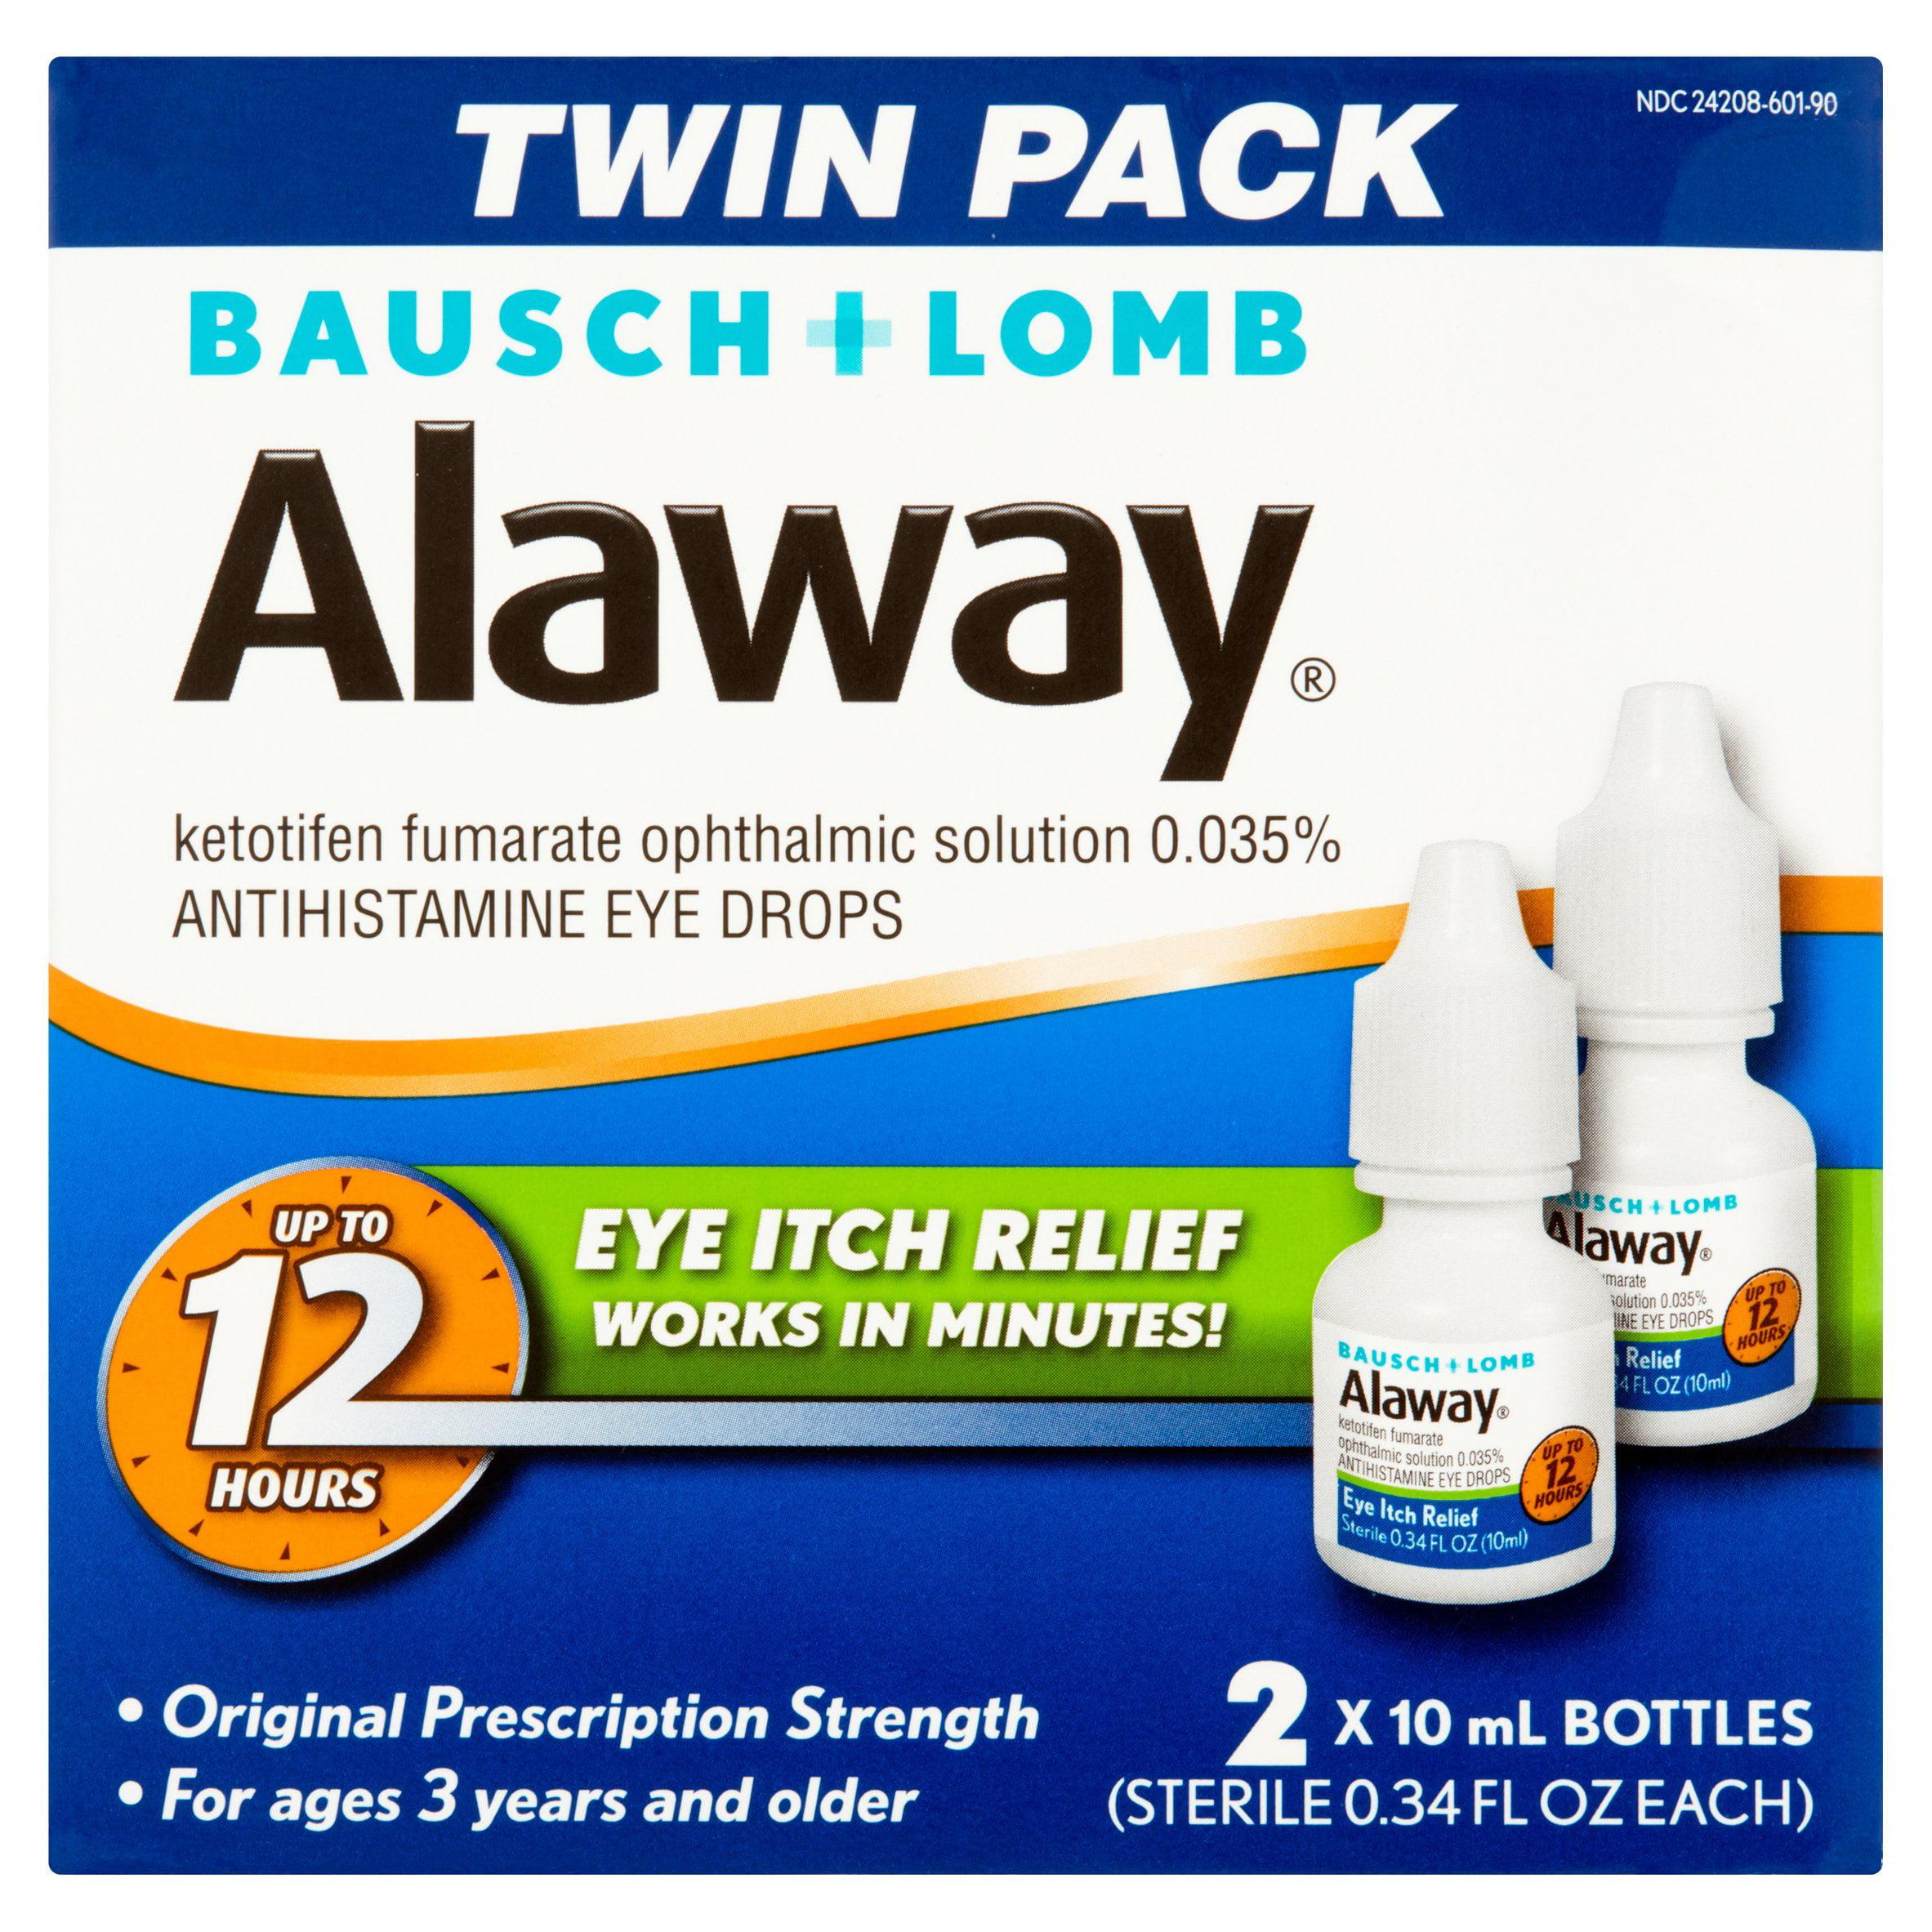 Bausch + Lomb Alaway Antihistamine Eye Drops Twin Pack, 0.34 fl oz, 2 count